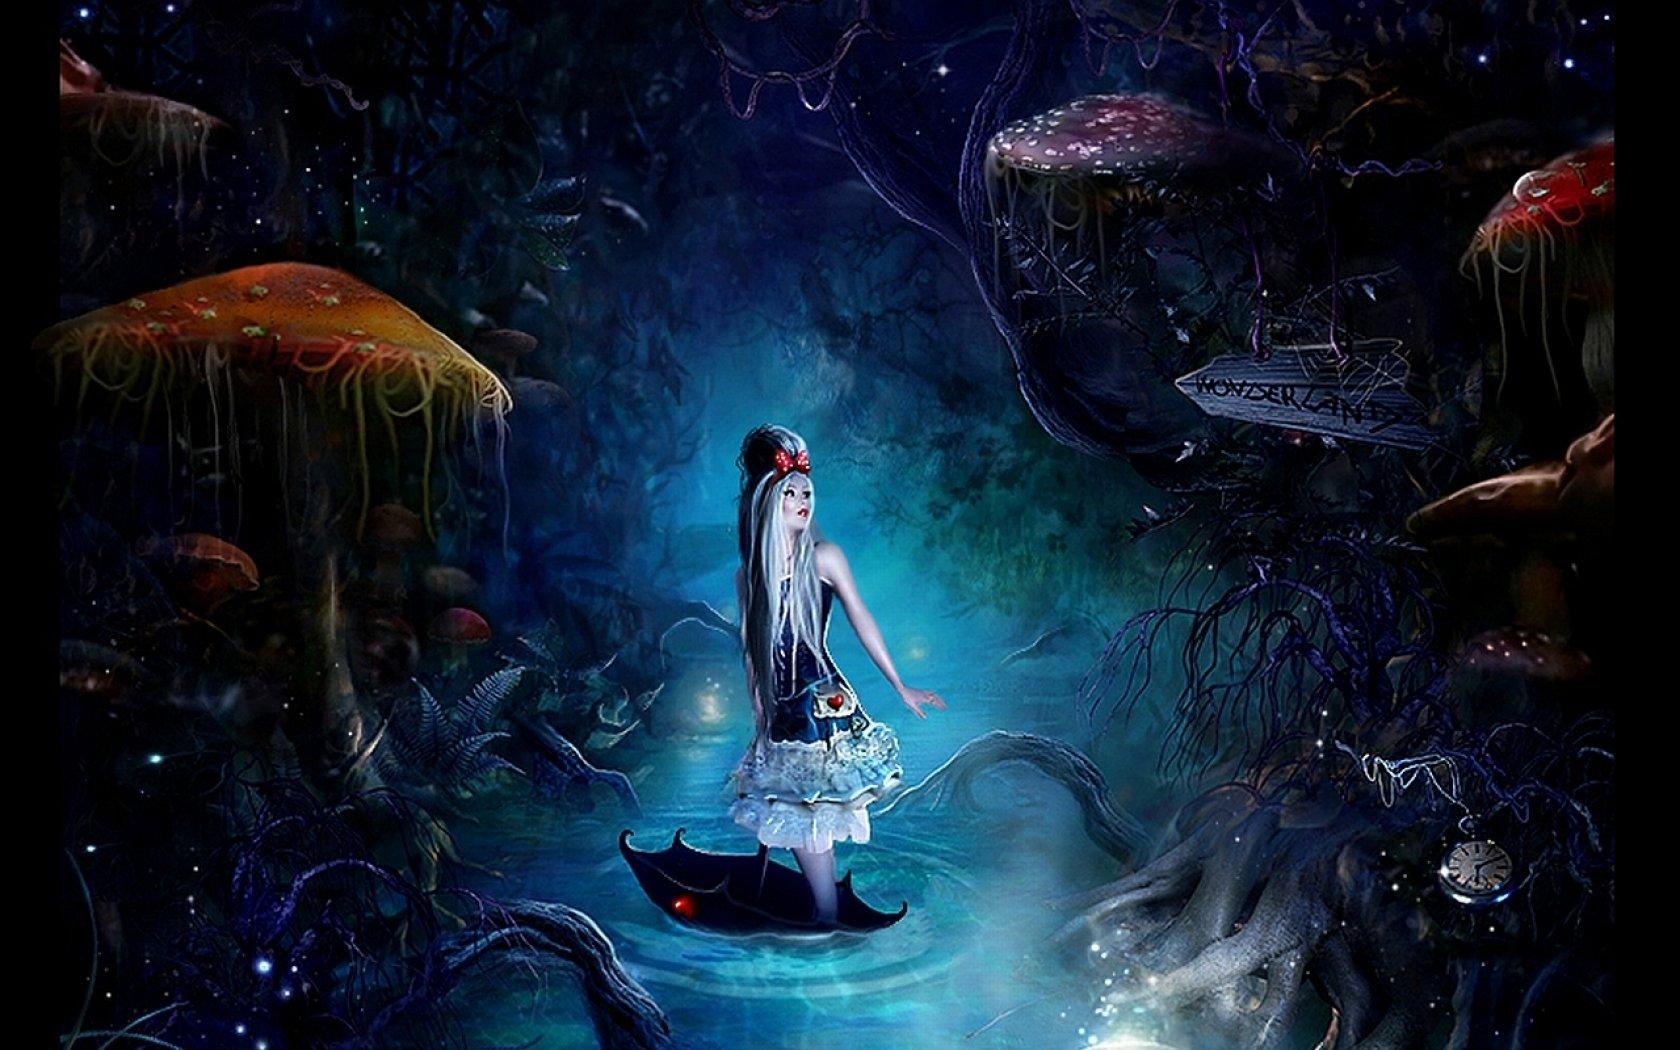 Alice In Wonderland Artwork wallpaper